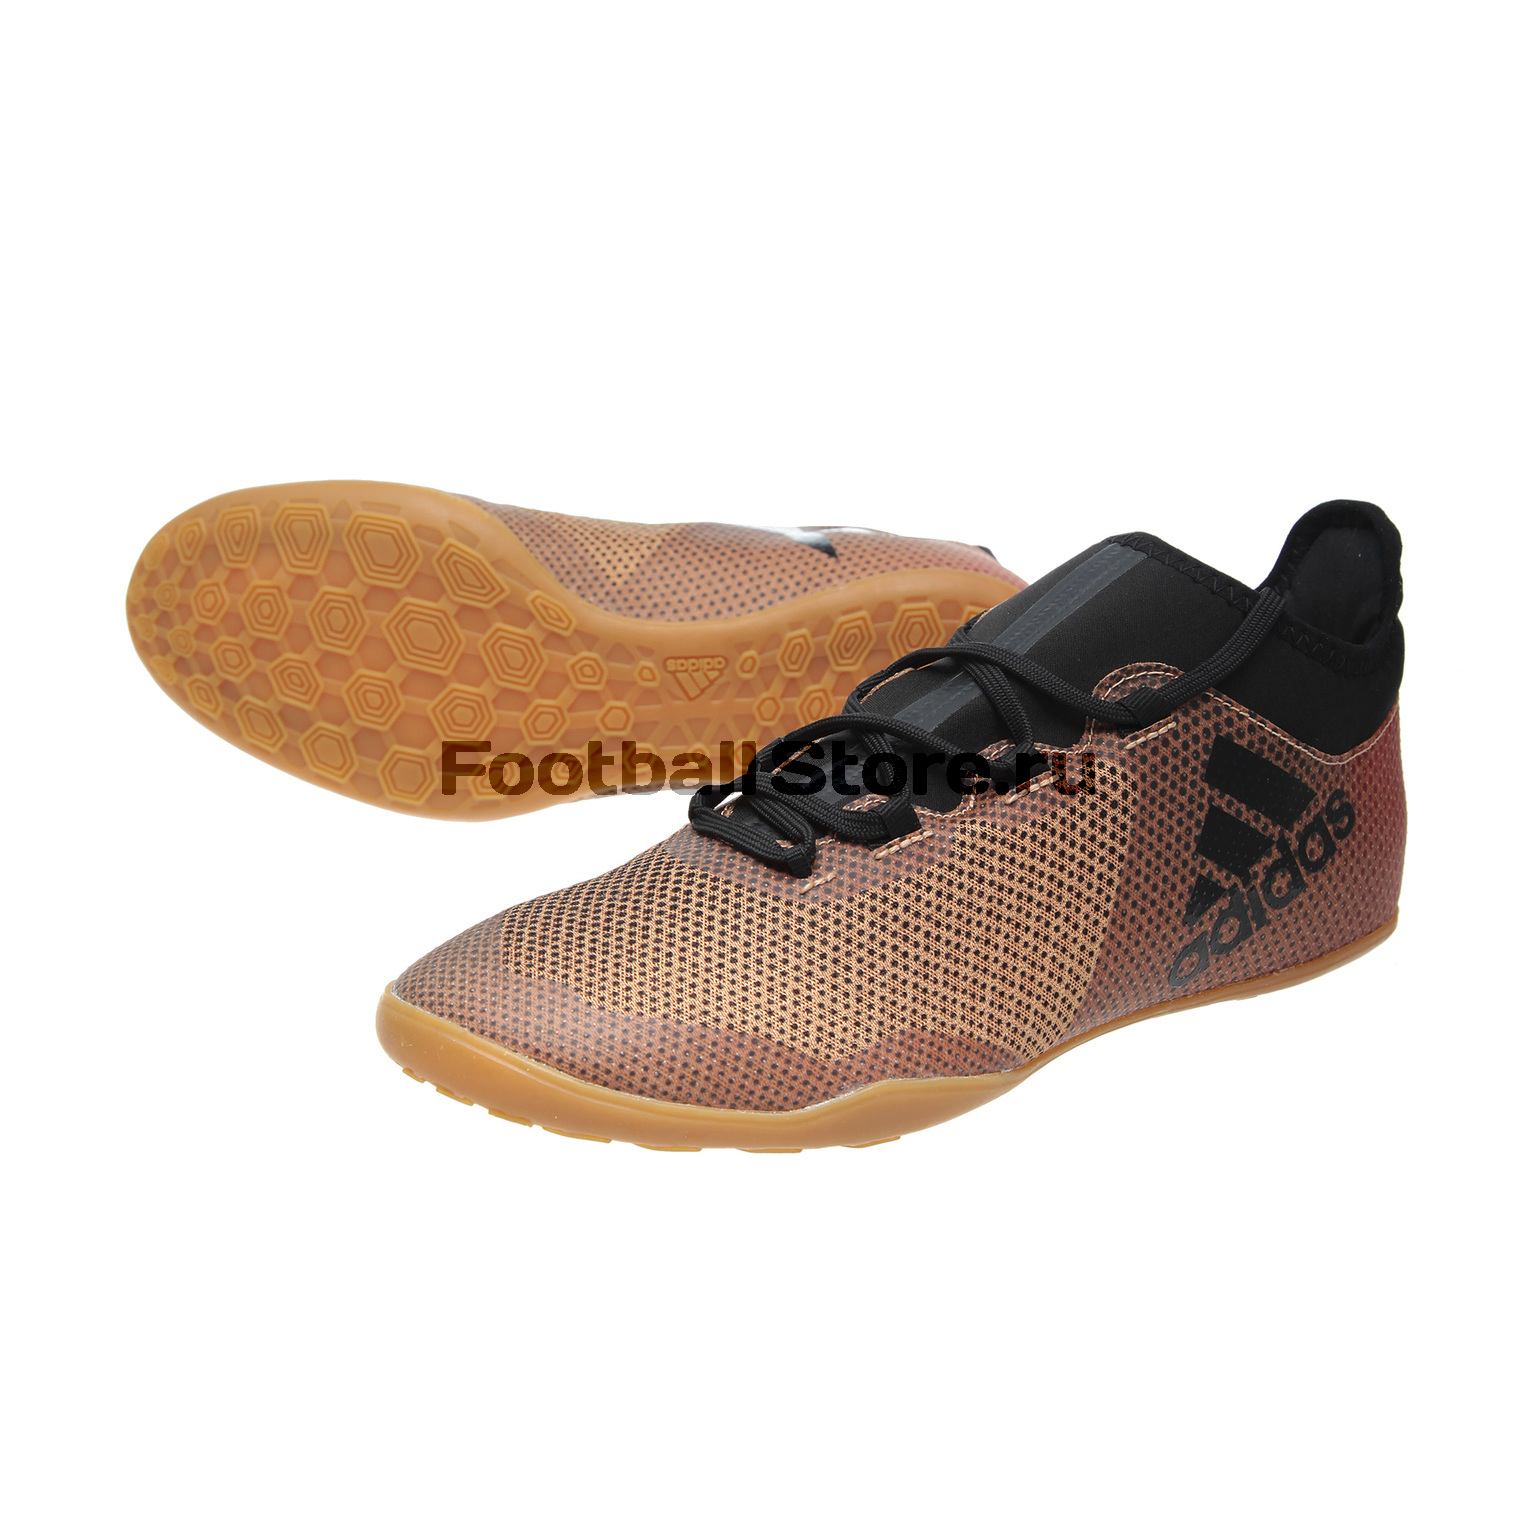 Обувь для зала Adidas X Tango 17.3 IN CP9139 обувь для зала adidas ace tango 18 3 in jr cp9075